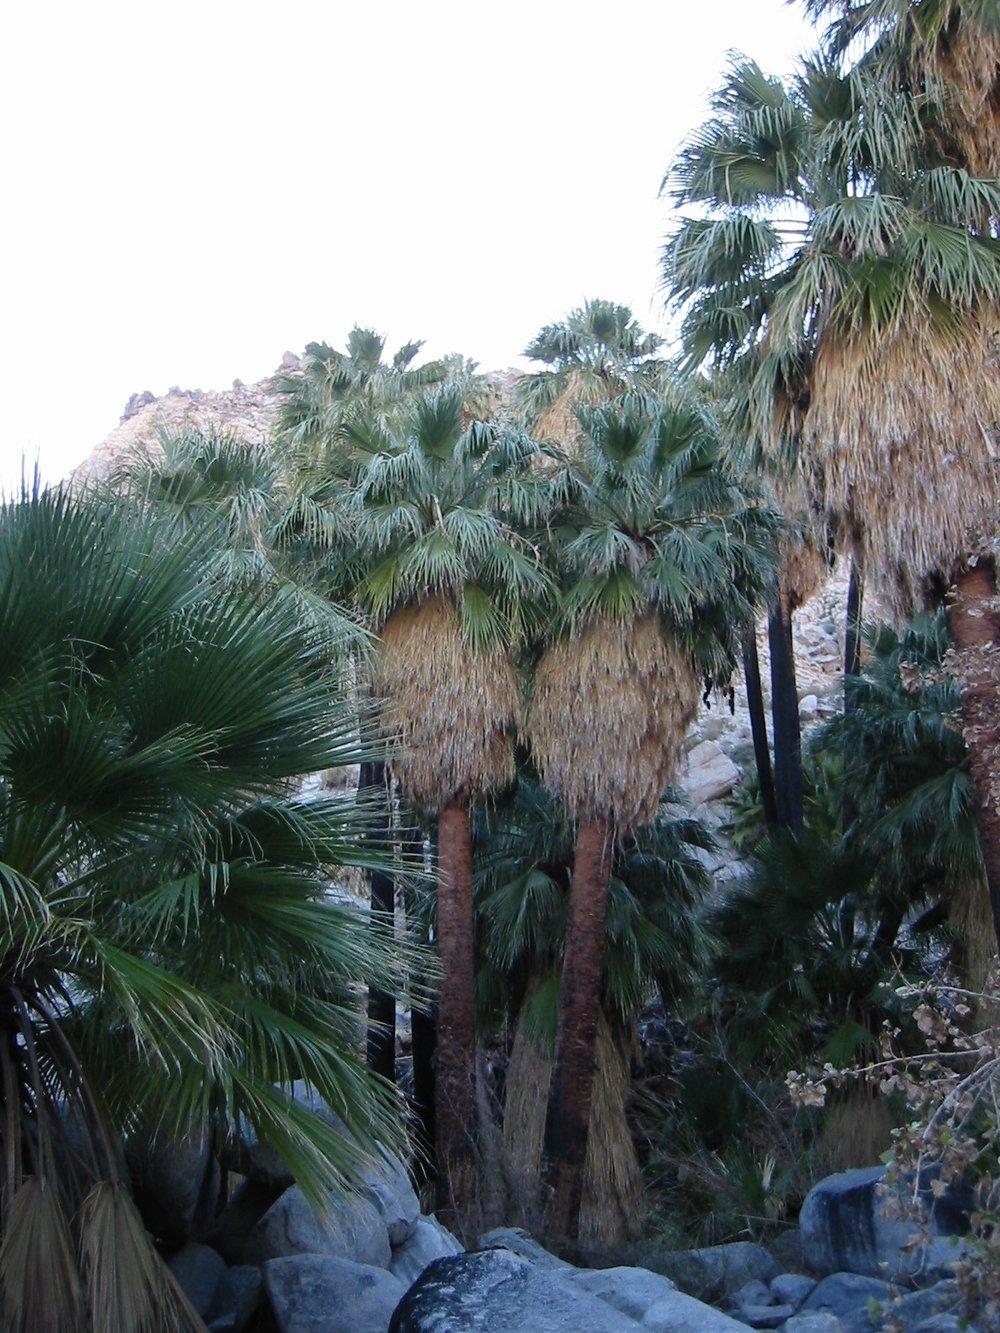 California Fan Palm ( Washingtonia filifera )anonymous, Washingtonia filifera , CC BY-SA 1.0